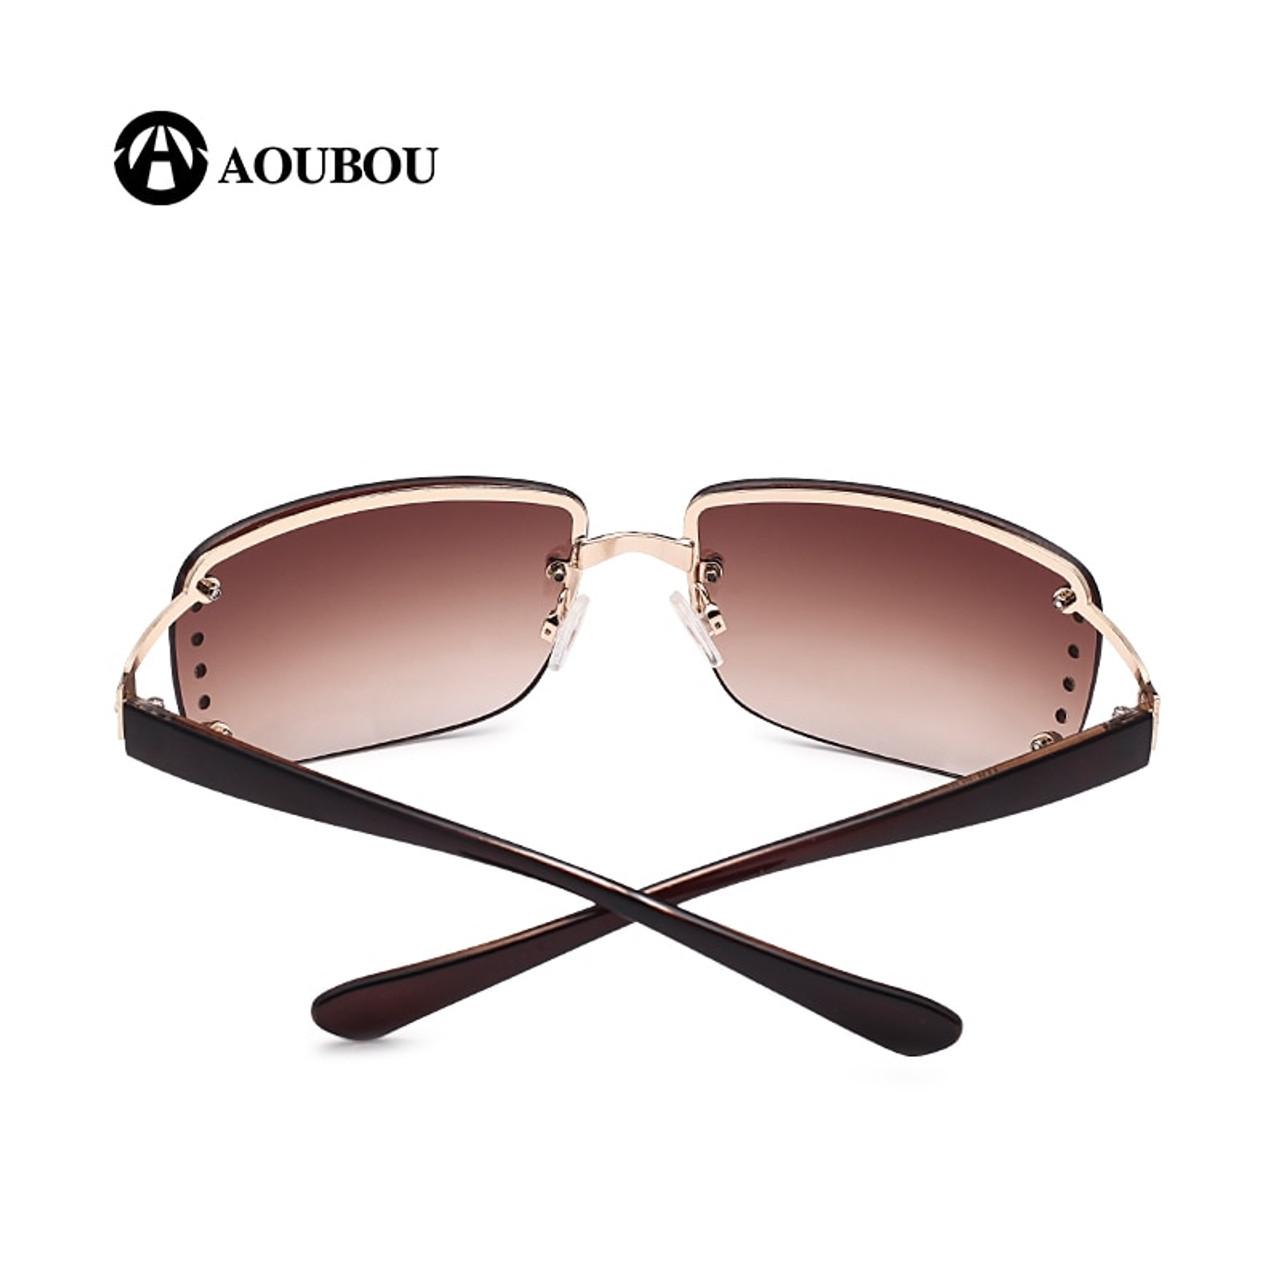 ... AOUBOU 2019 Vintage Rimless Sunglasses Women Luxury Diamond Design  White Square Frame Brand Sun Glasses For ...